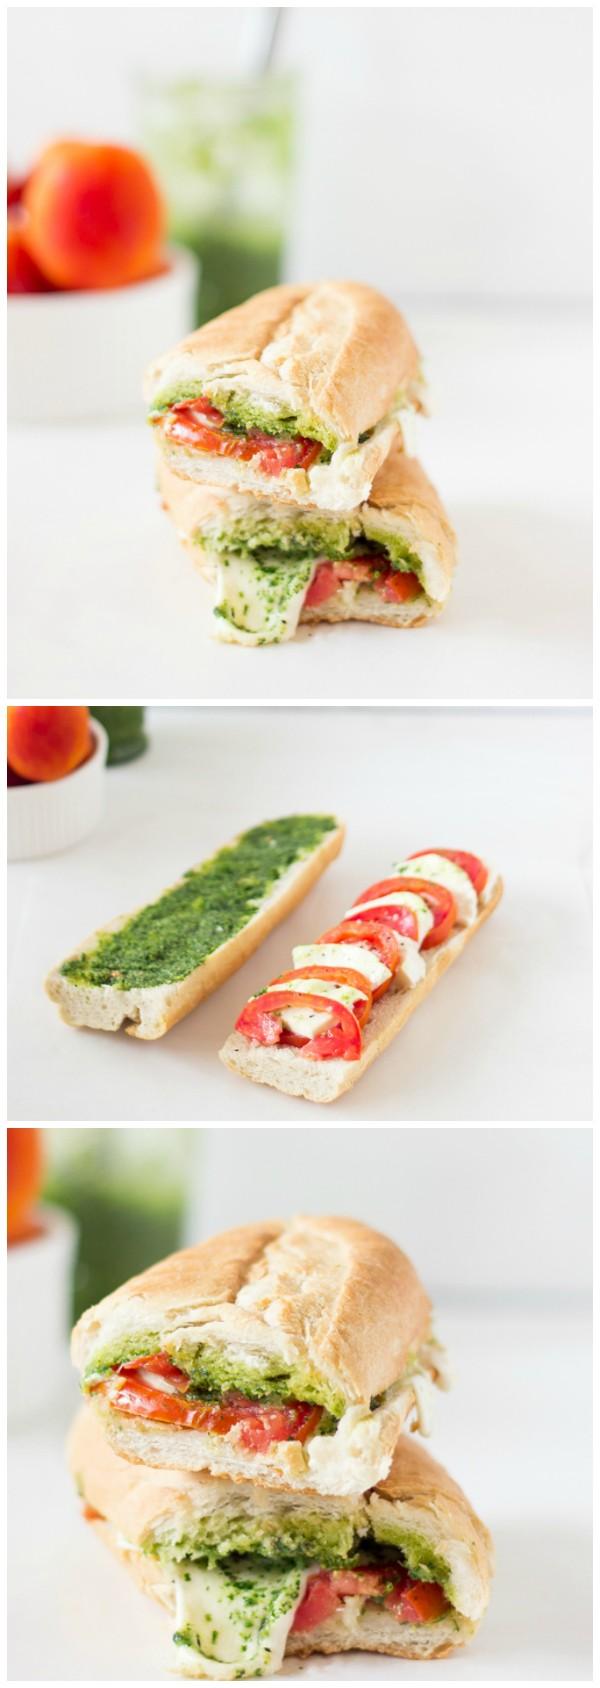 Get the recipe Caprese Sandwich Parsley Pesto @recipes_to_go